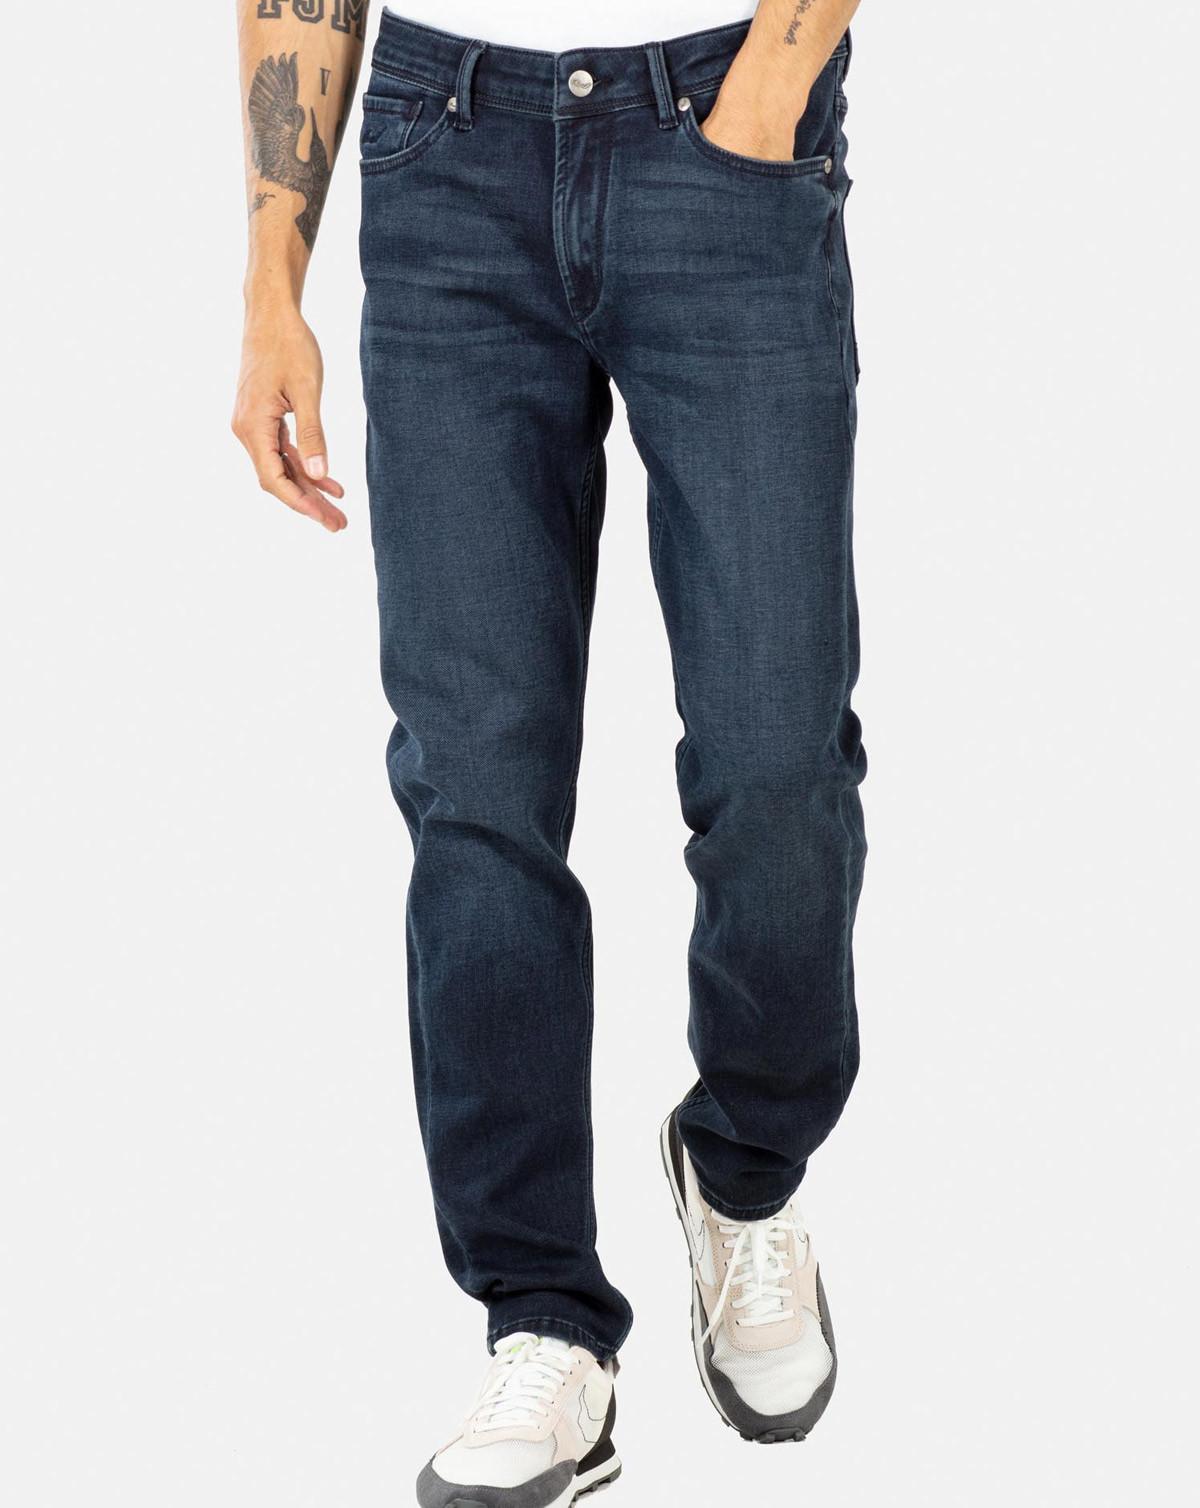 Reell Spider Jeans (Dark Blue Overdyed, W36 / L34)